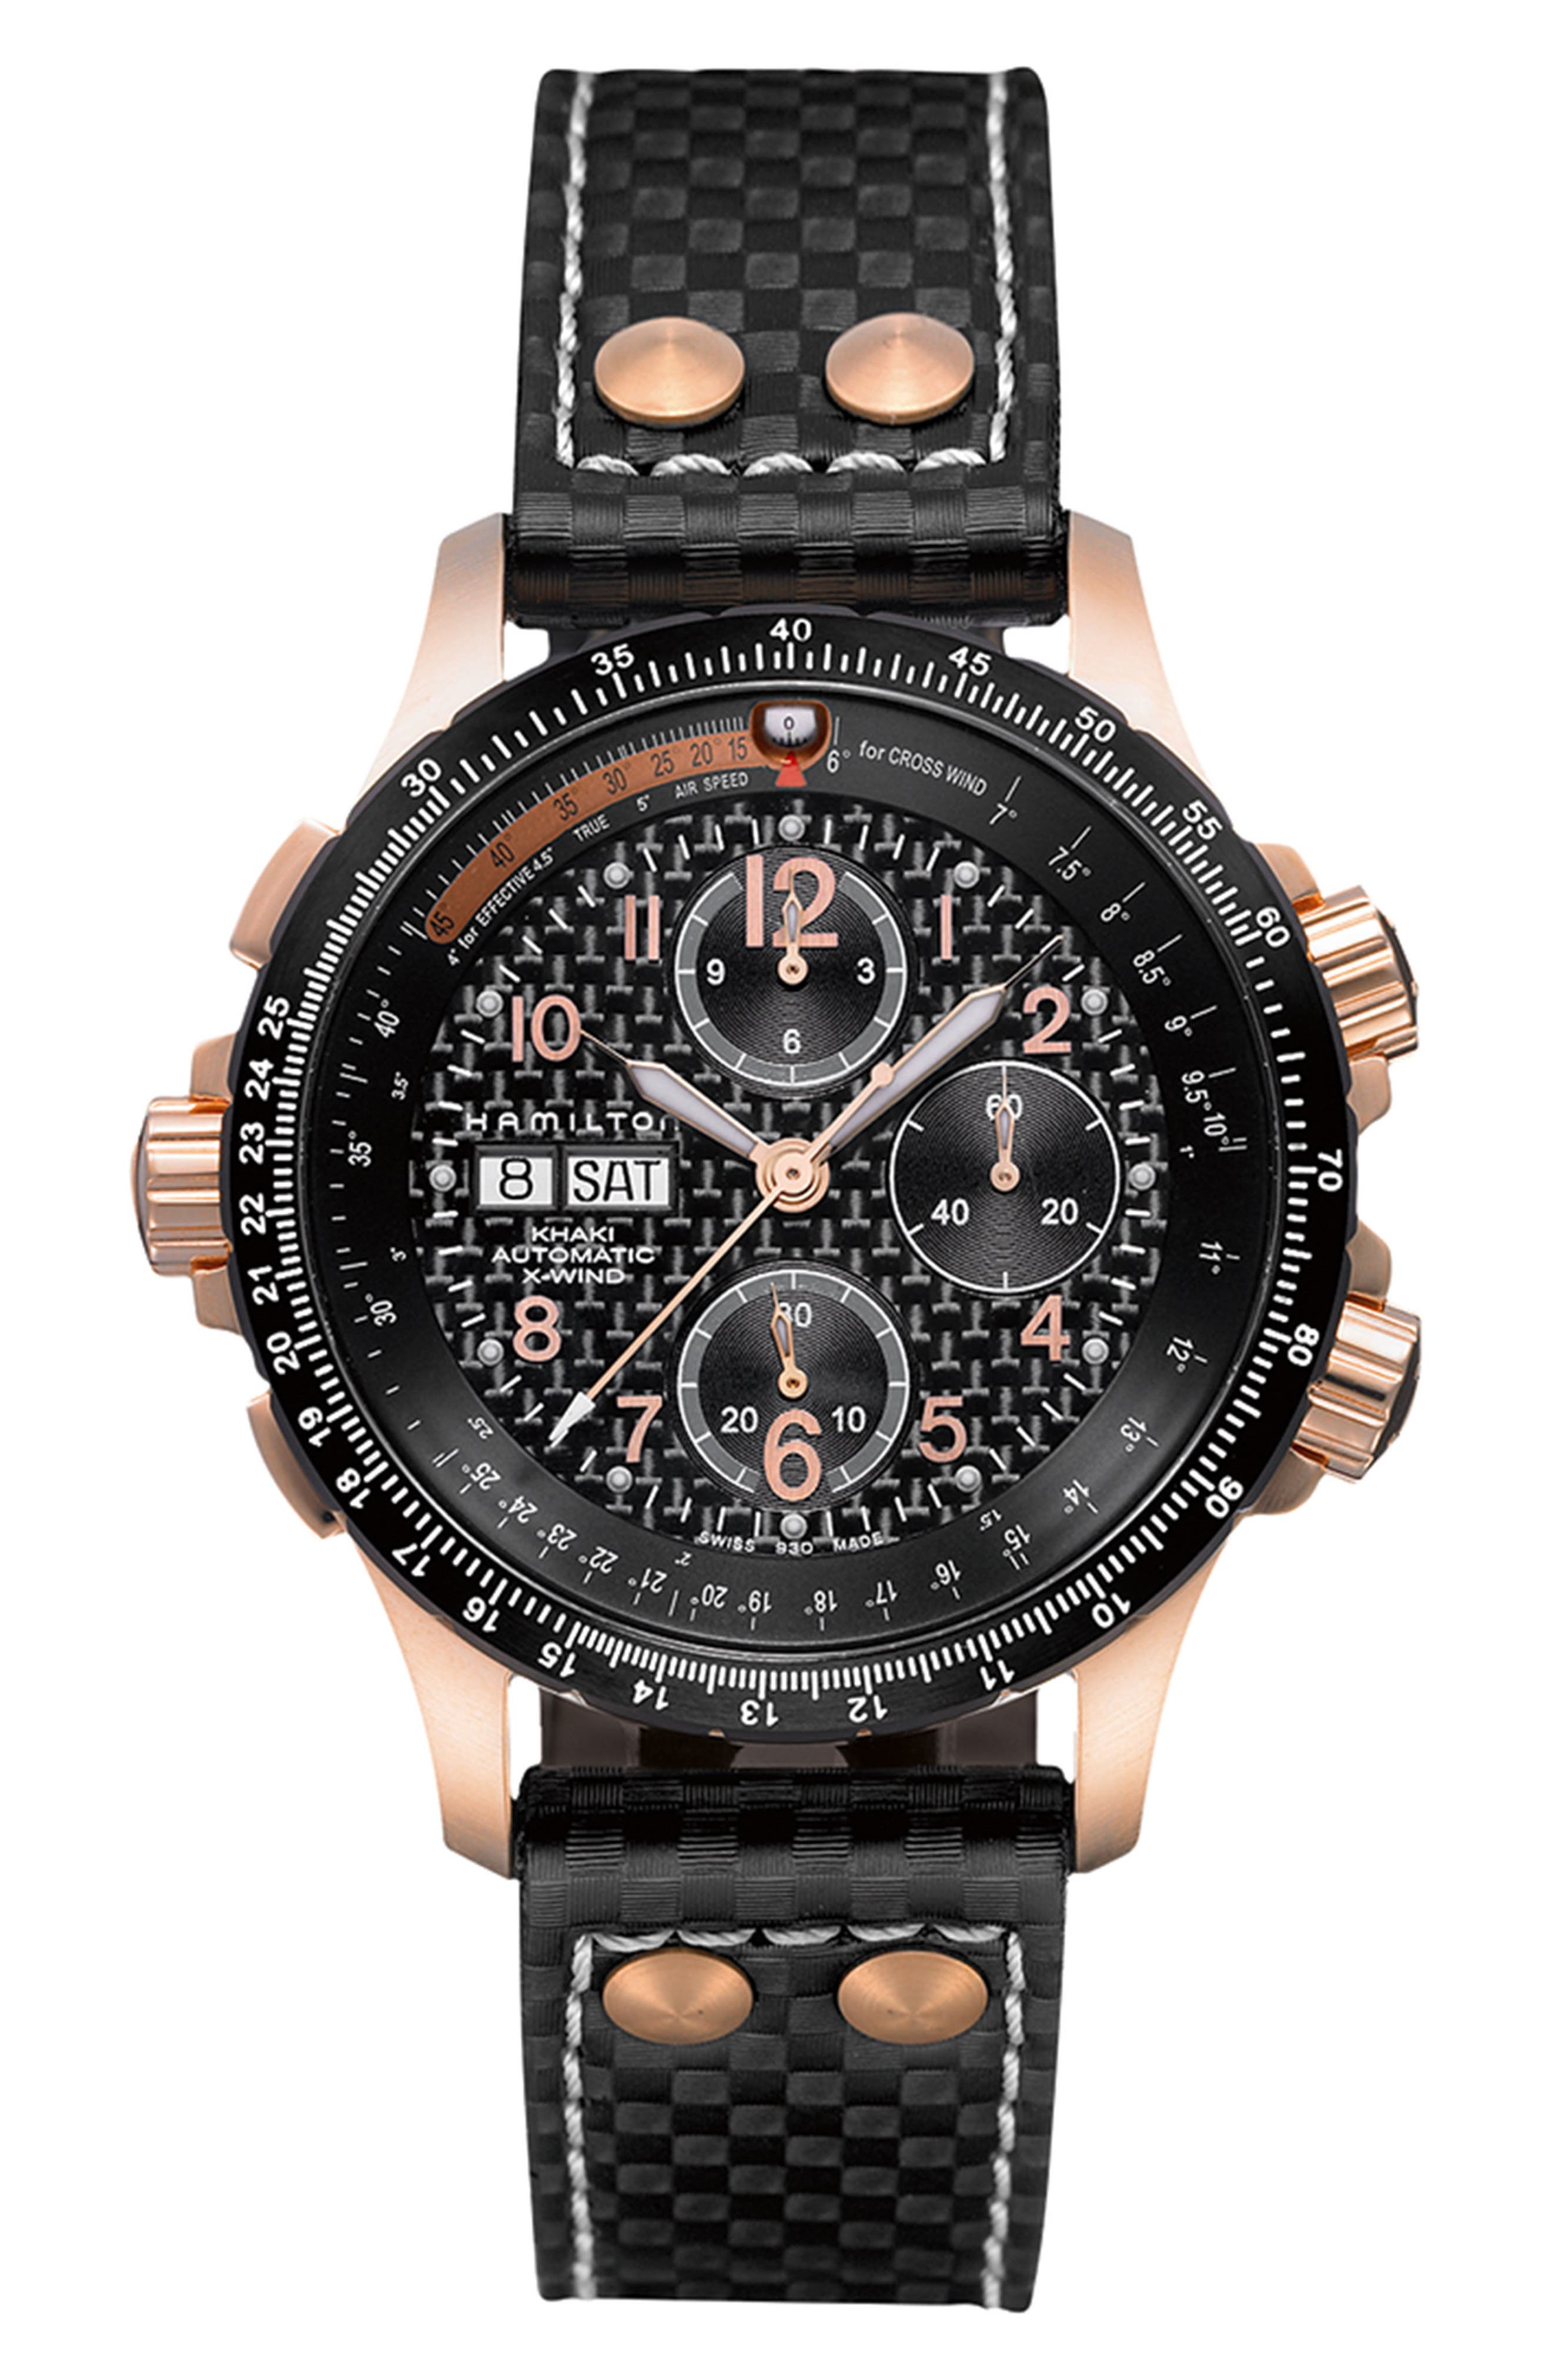 HAMILTON Khaki X-Wind Automatic Chronograph Leather Strap Watch, 44mm, Main, color, BLACK/ ROSE GOLD